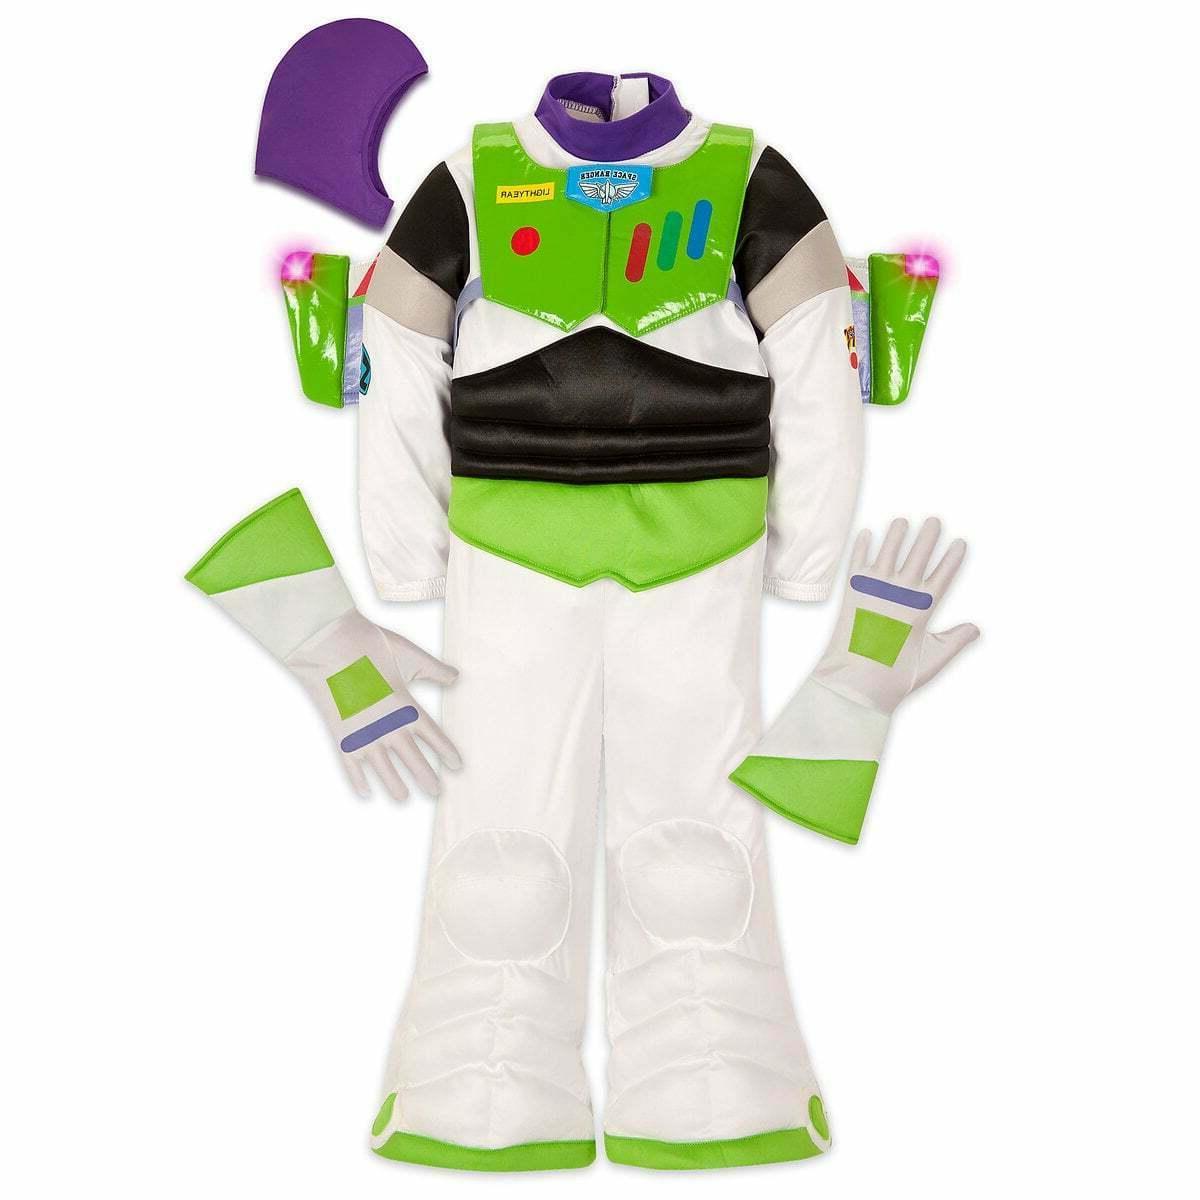 new store buzz lightyear costume light up